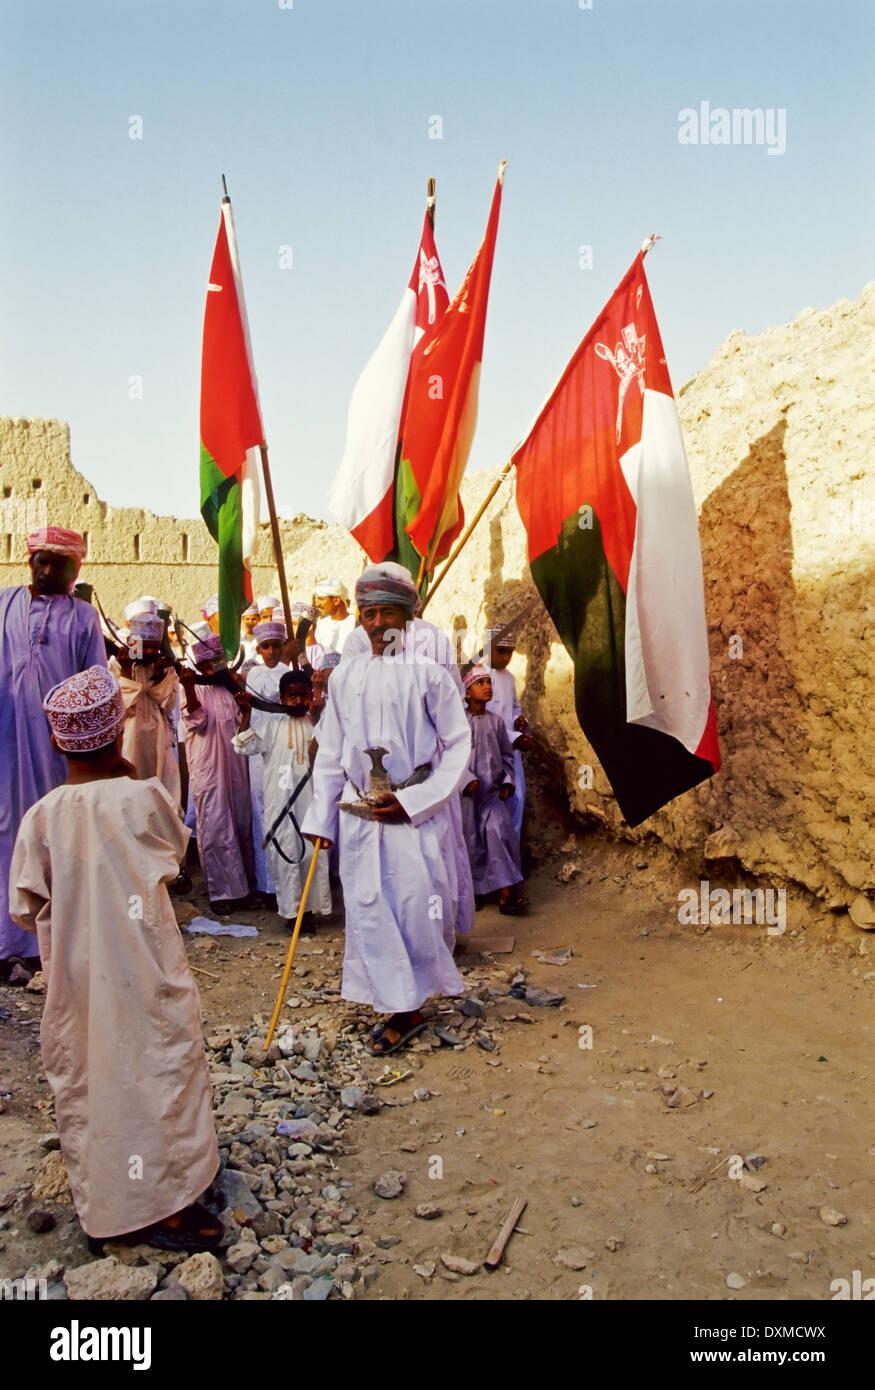 Download Oman Eid Al-Fitr 2018 - omani-men-in-procession-with-omani-flags-at-the-eid-al-fitr-celebrations-DXMCWX  2018_18563 .jpg